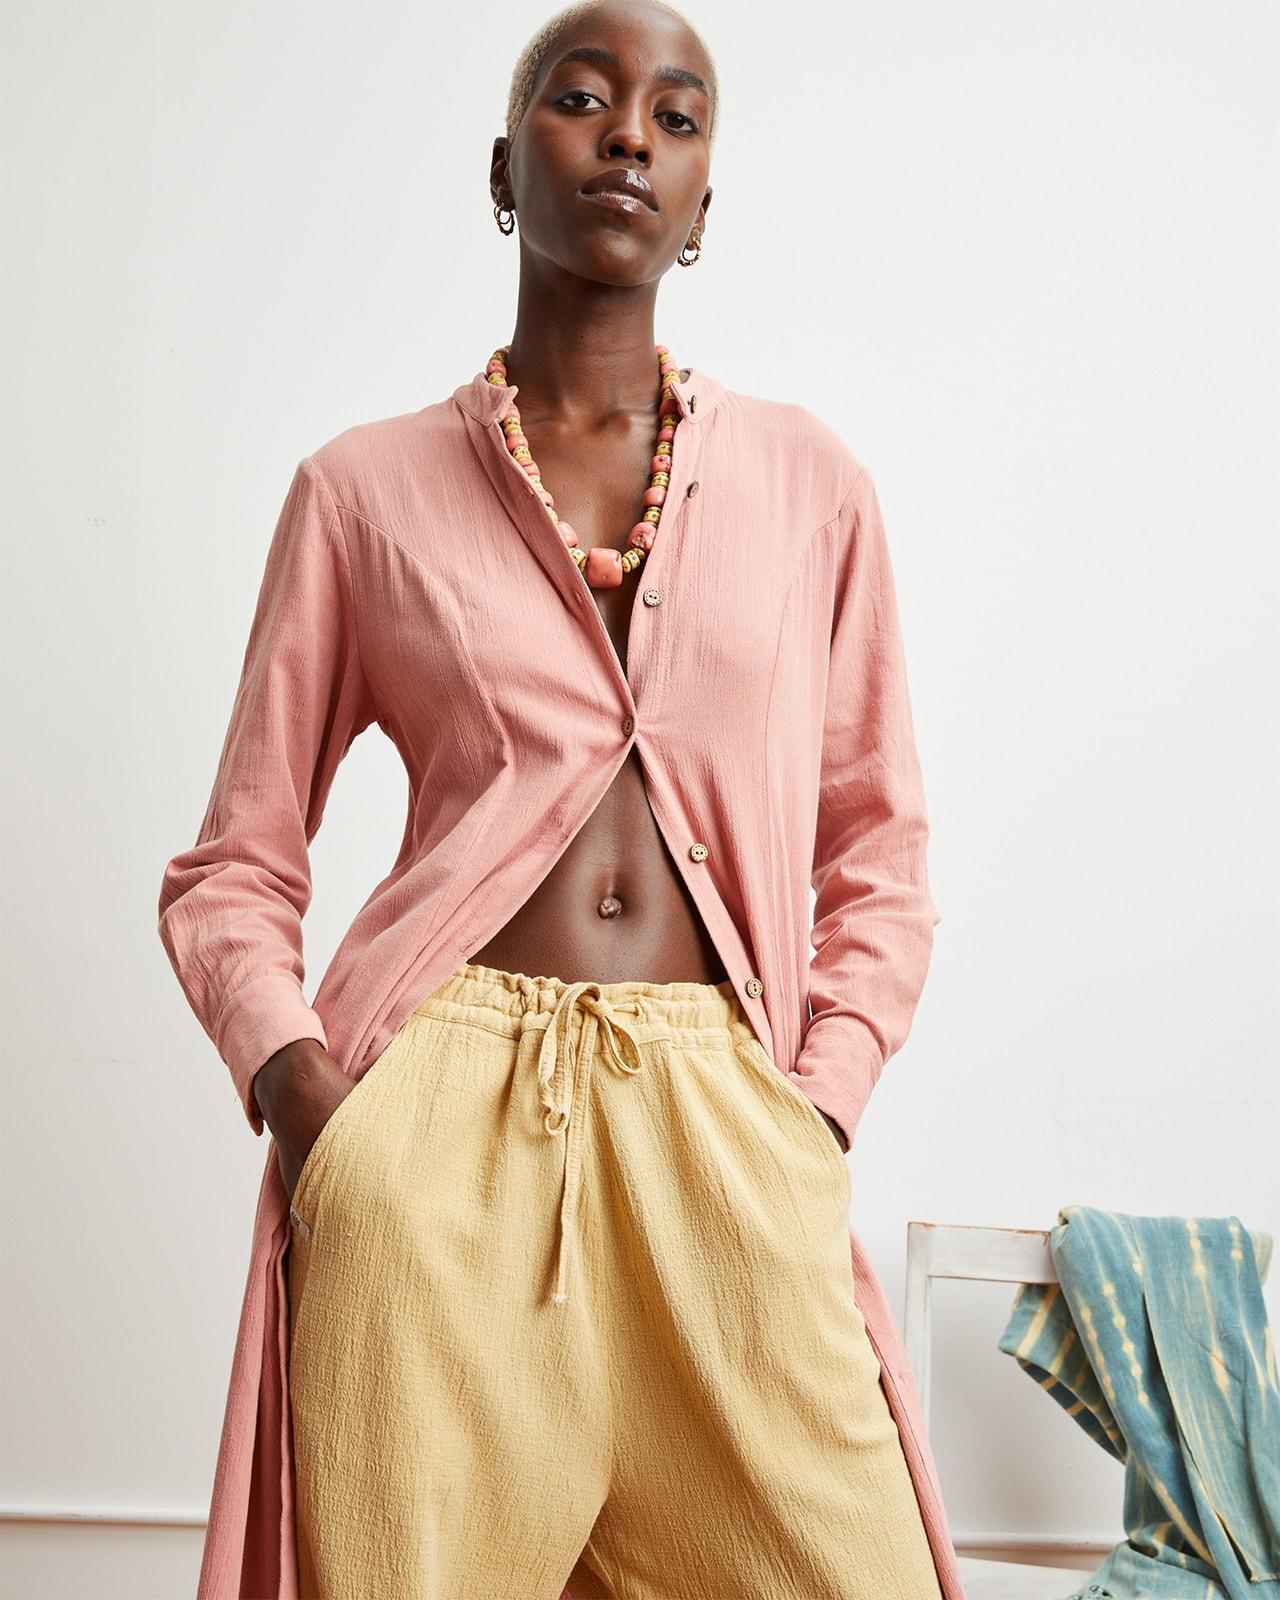 New York Fashion Week SS22 Spring Summer 2022 Emerging Black Designer A.Potts Lookbook